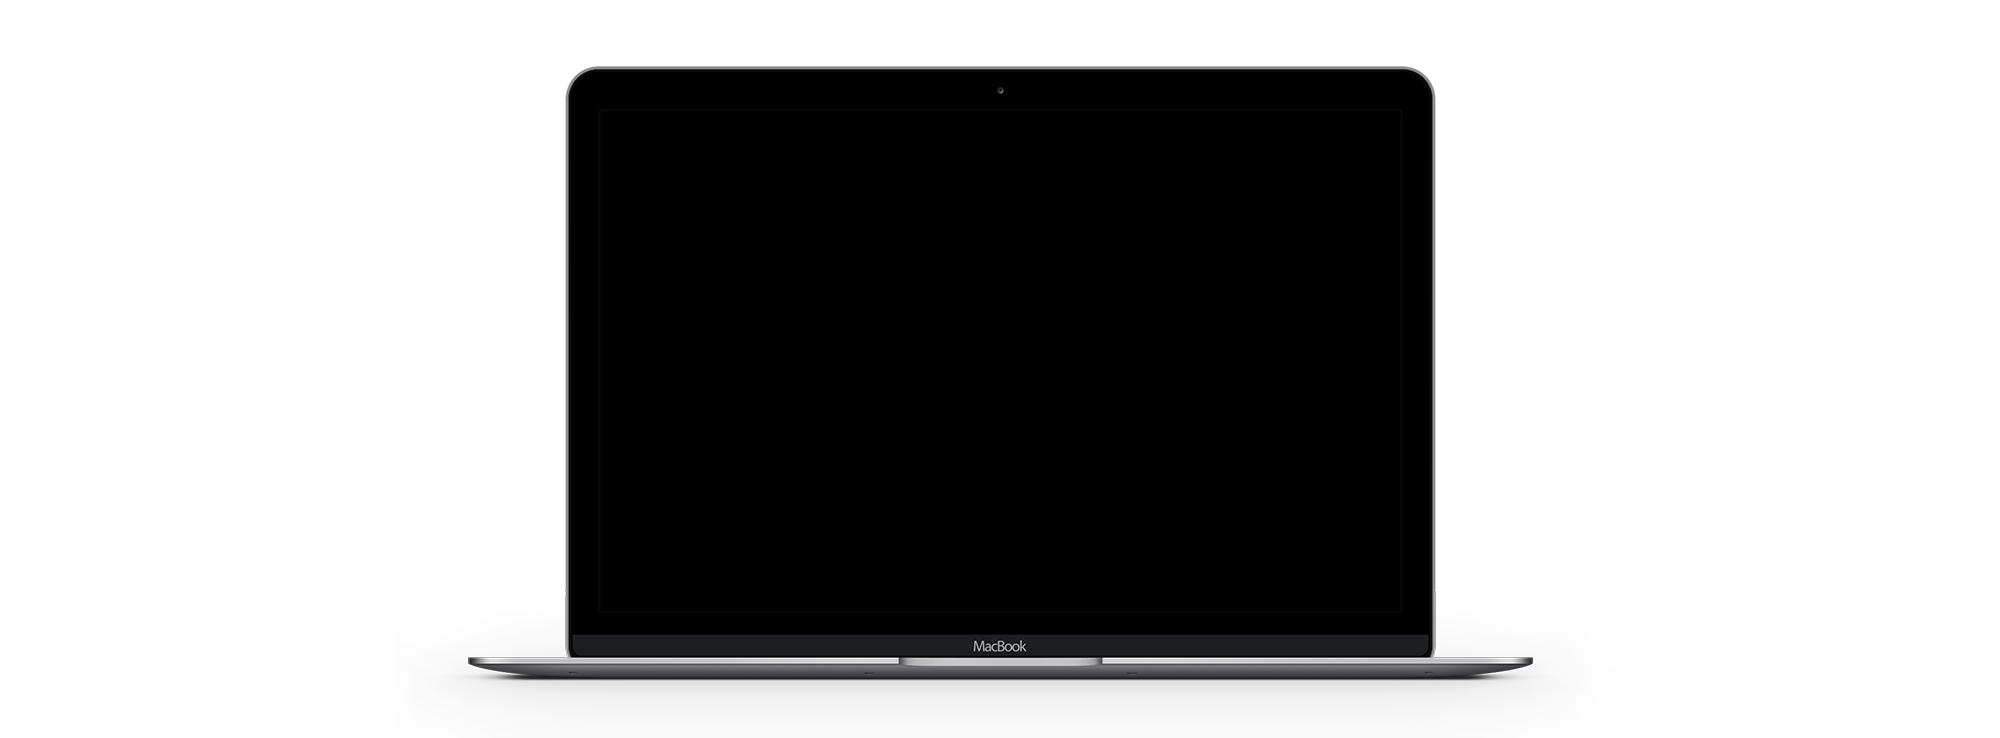 MacBook_whitebg.png